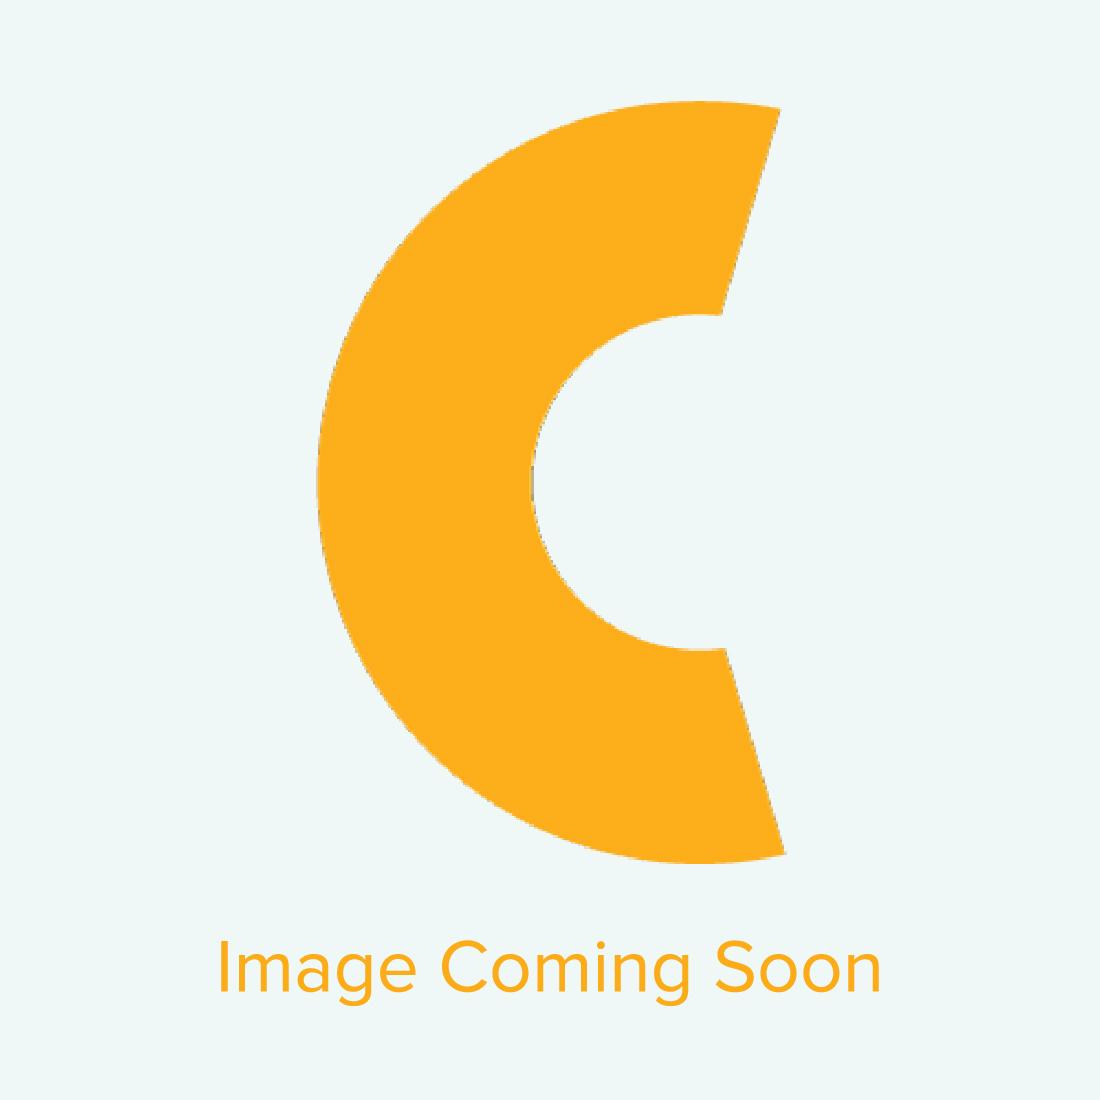 "SubliColor Premium Sublimation Transfer Paper Roll - 65 gsm - 63.8"" x 656'"